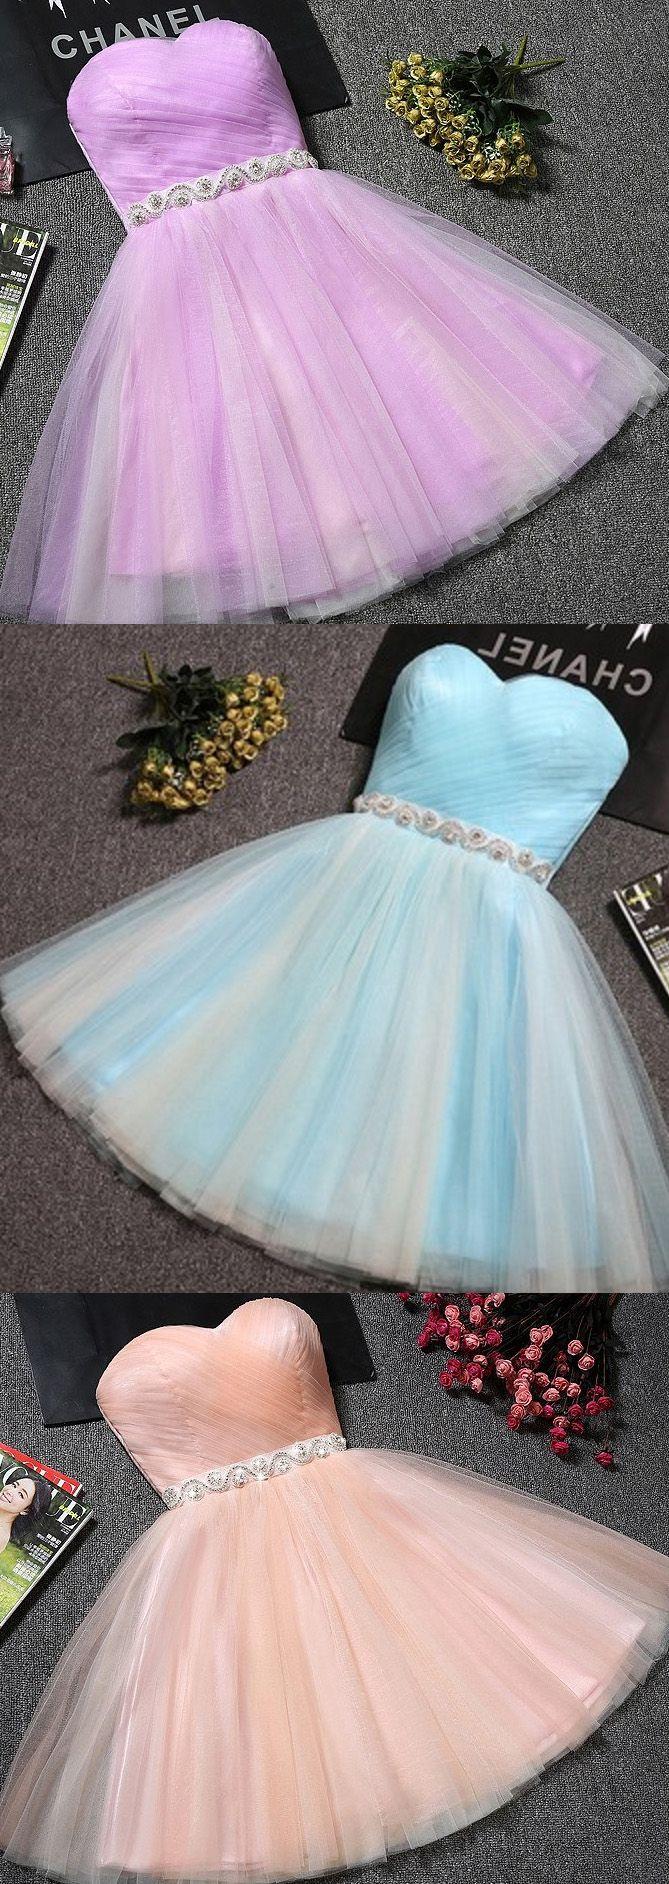 2326 best Homecoming images on Pinterest | Short prom dresses ...